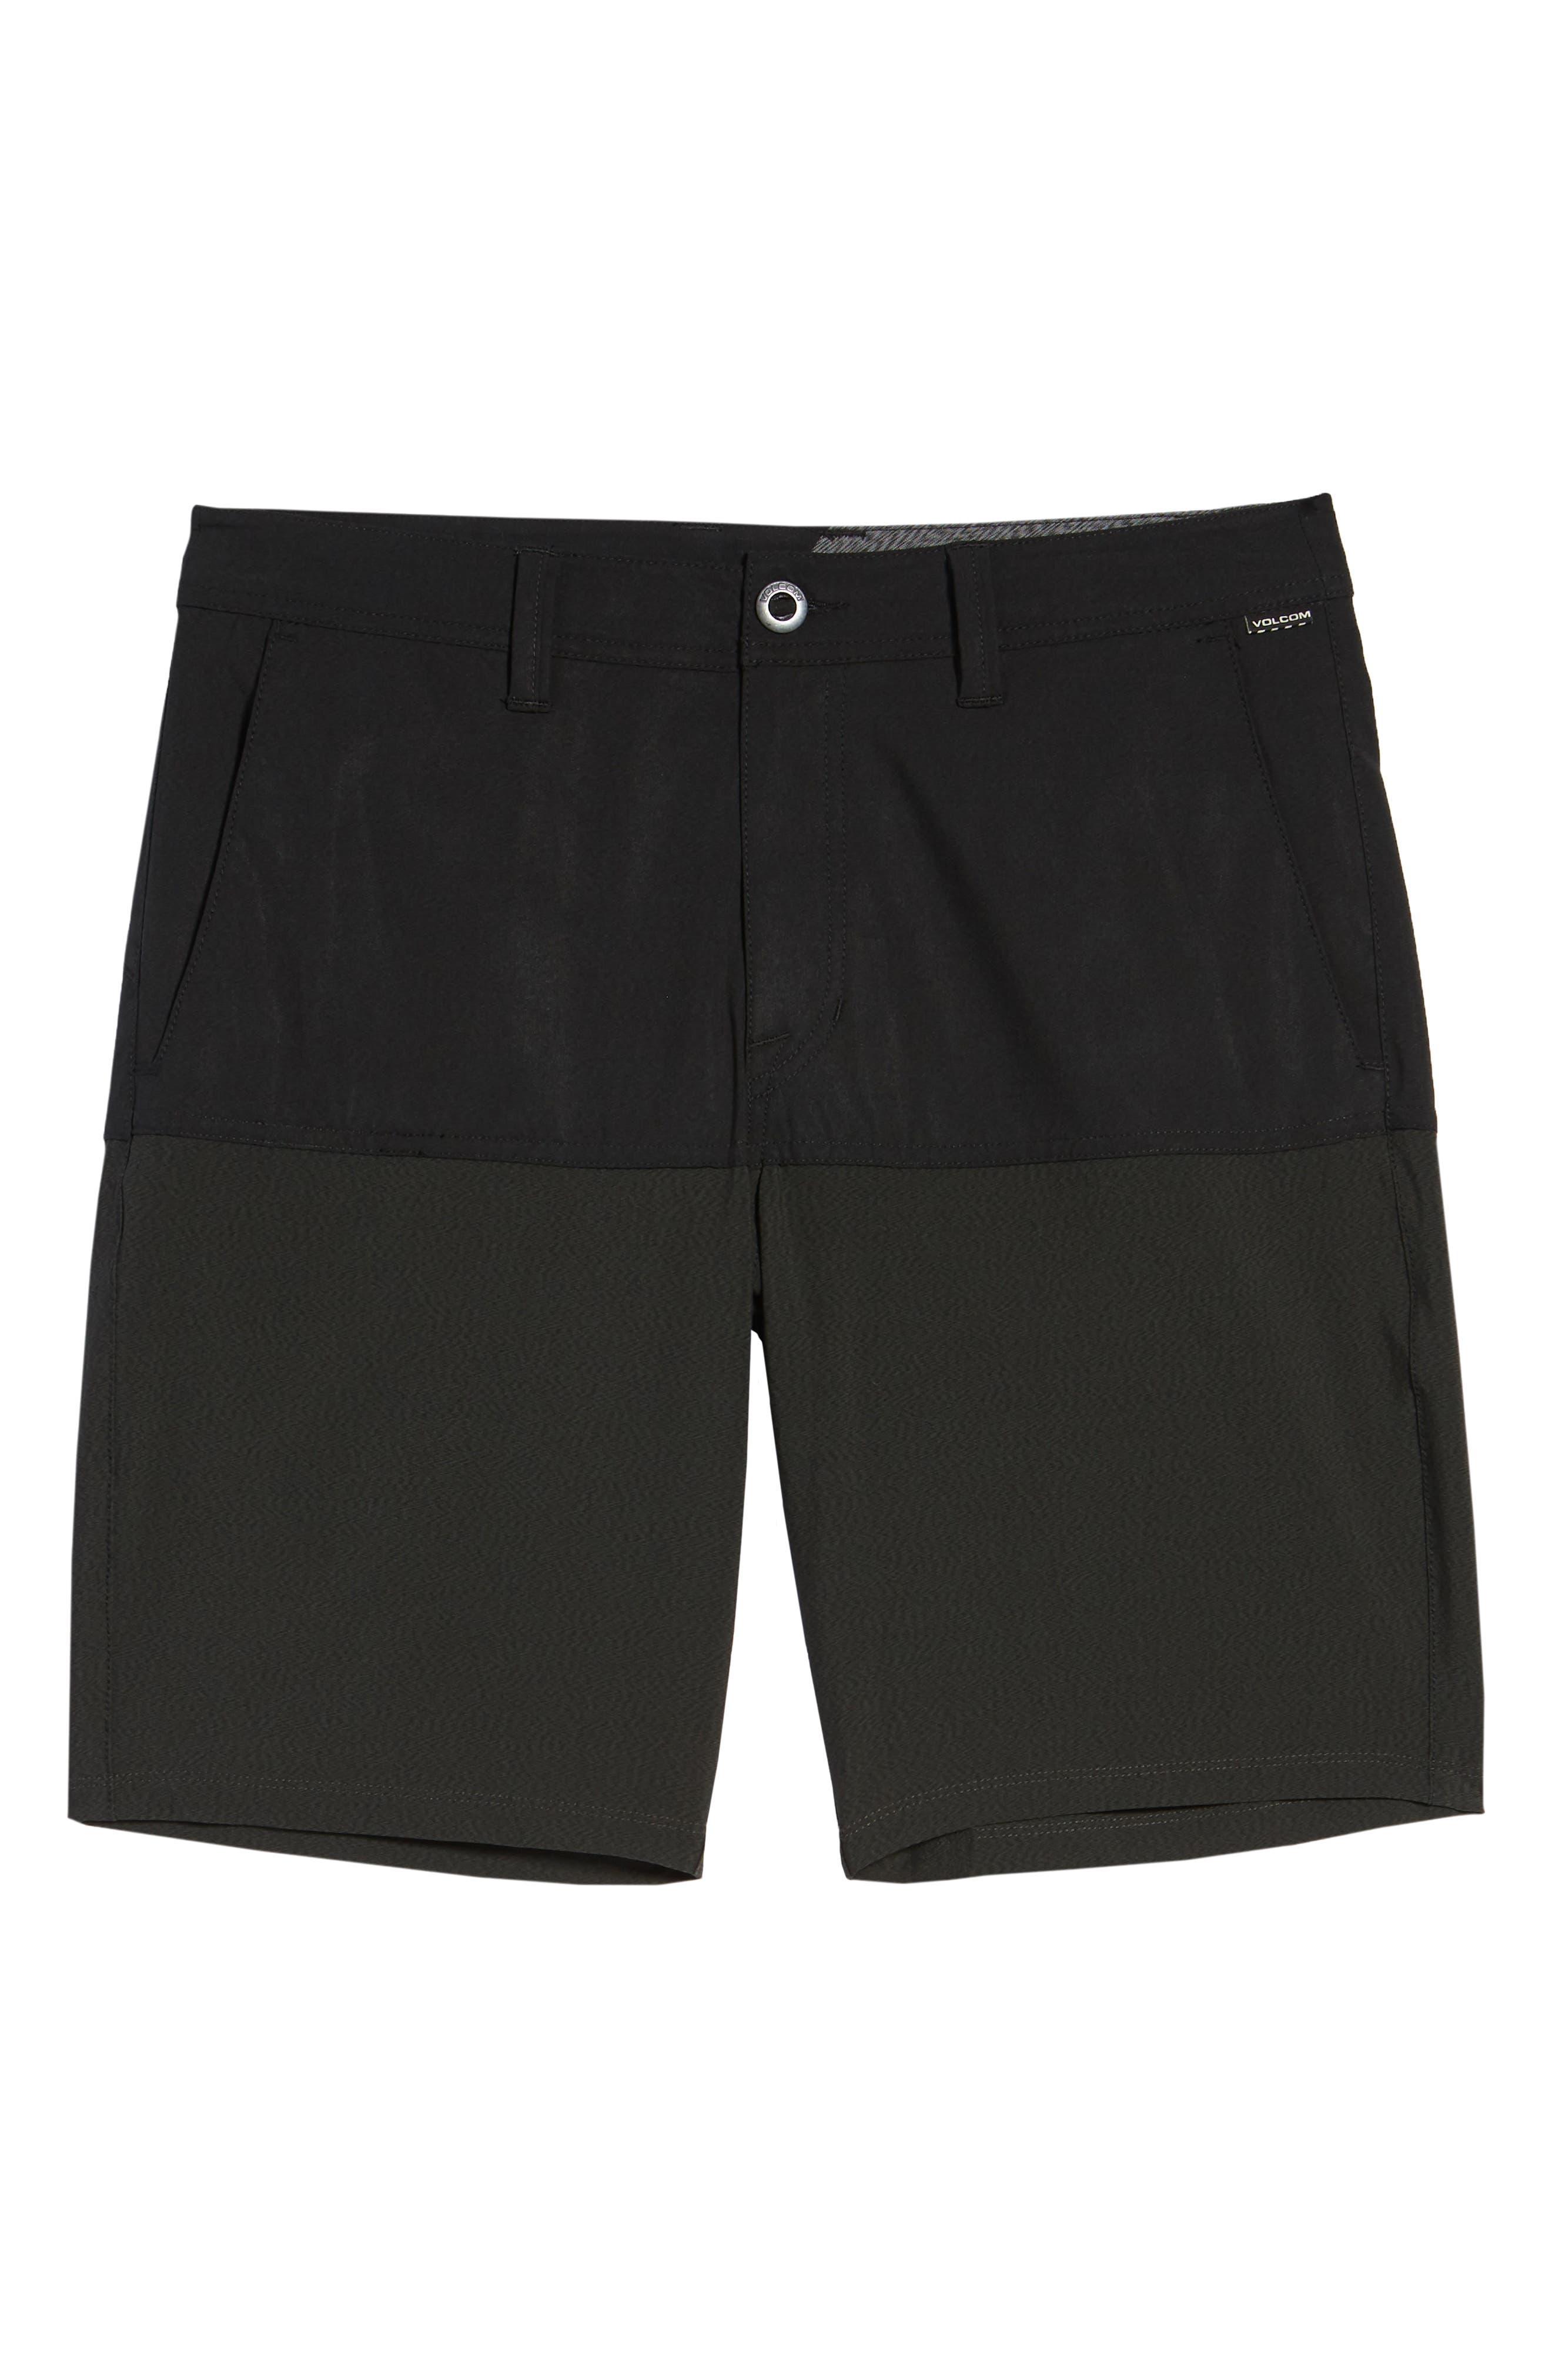 Surf 'n Turf Block Hybrid Shorts,                             Alternate thumbnail 6, color,                             Black